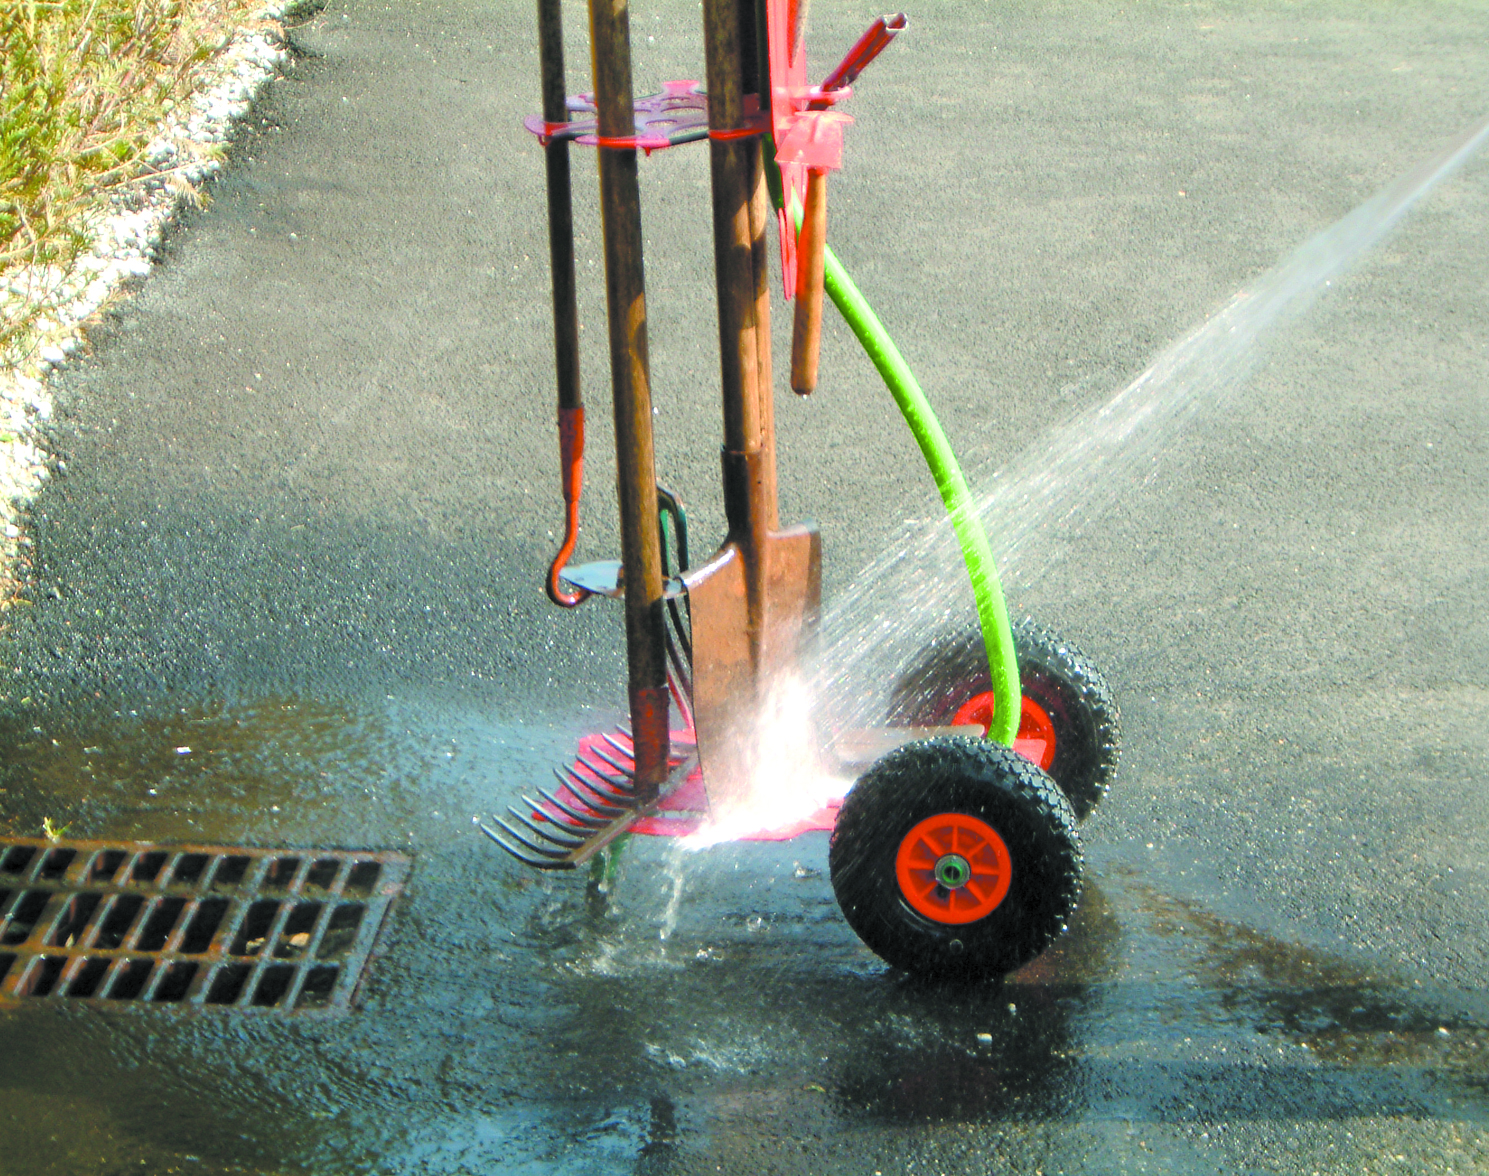 Cleant garden trolley